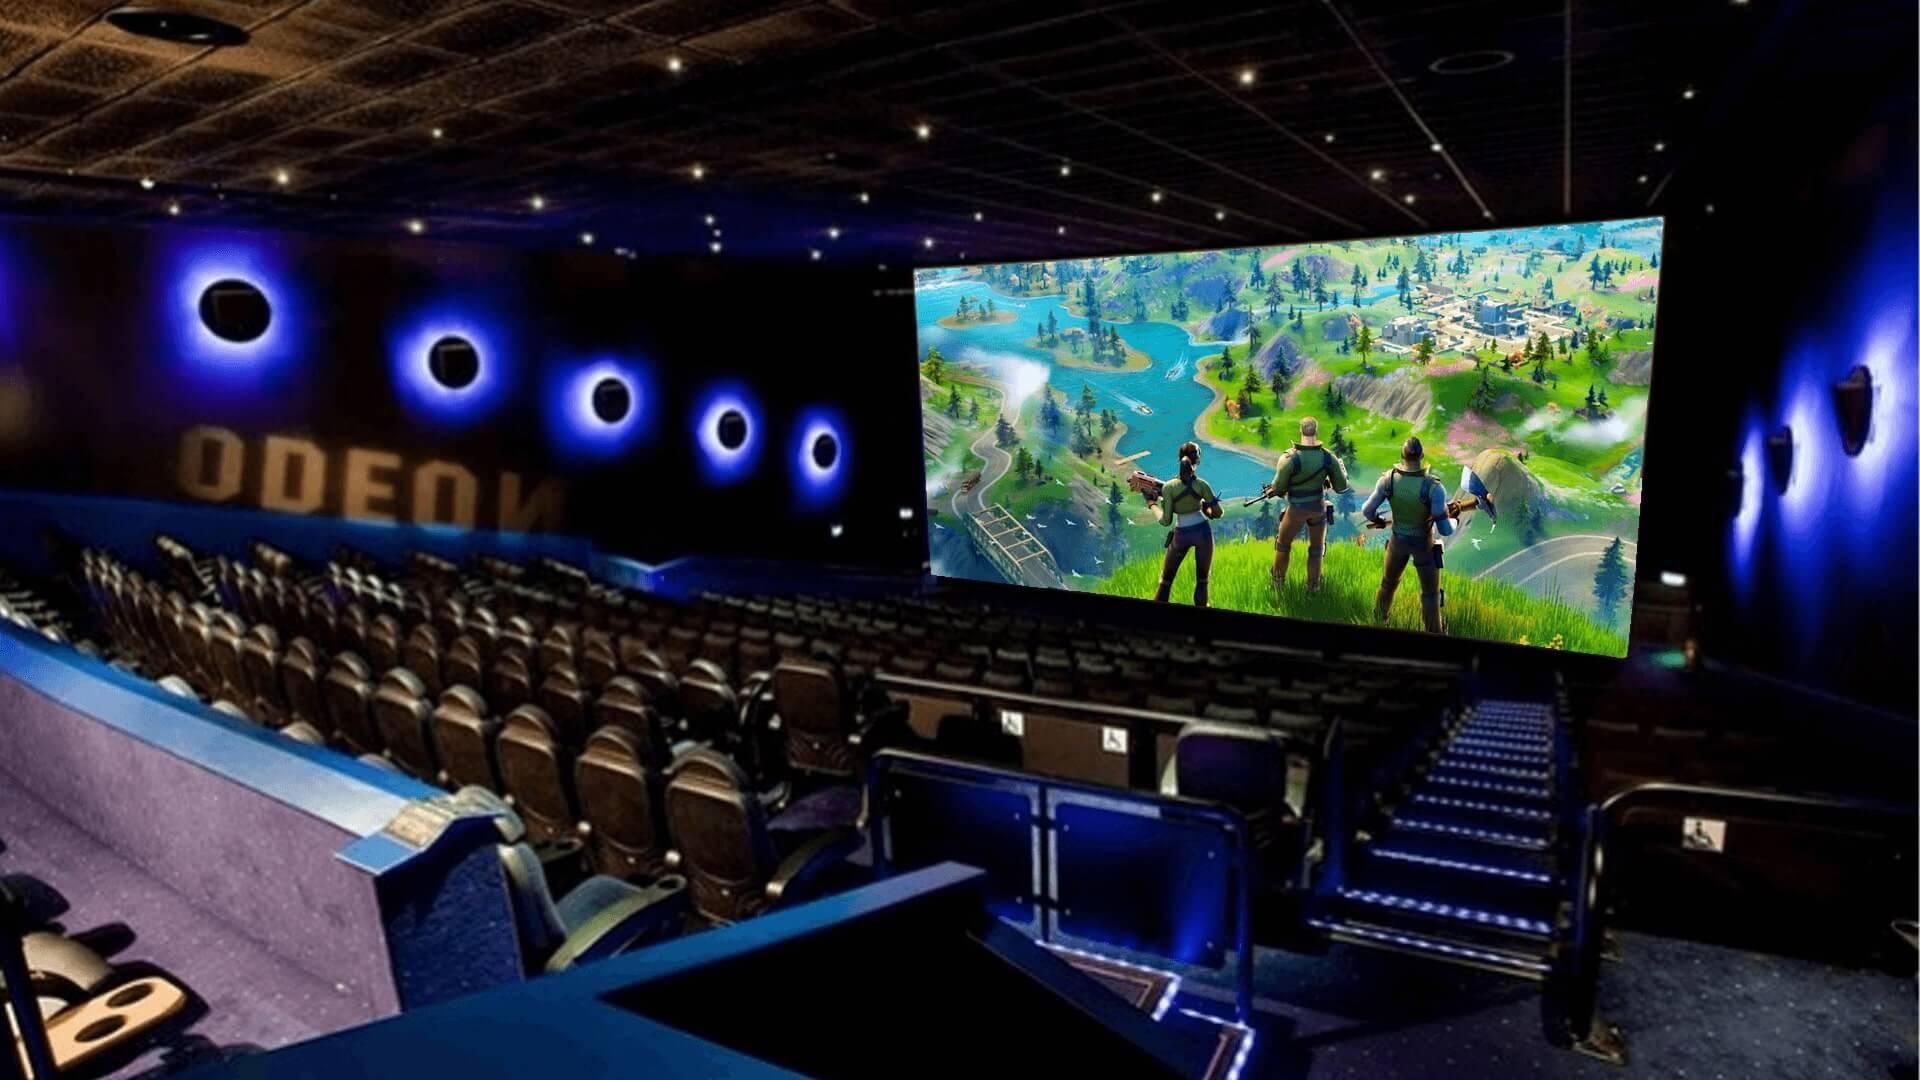 gaming in an odeon cinema screen